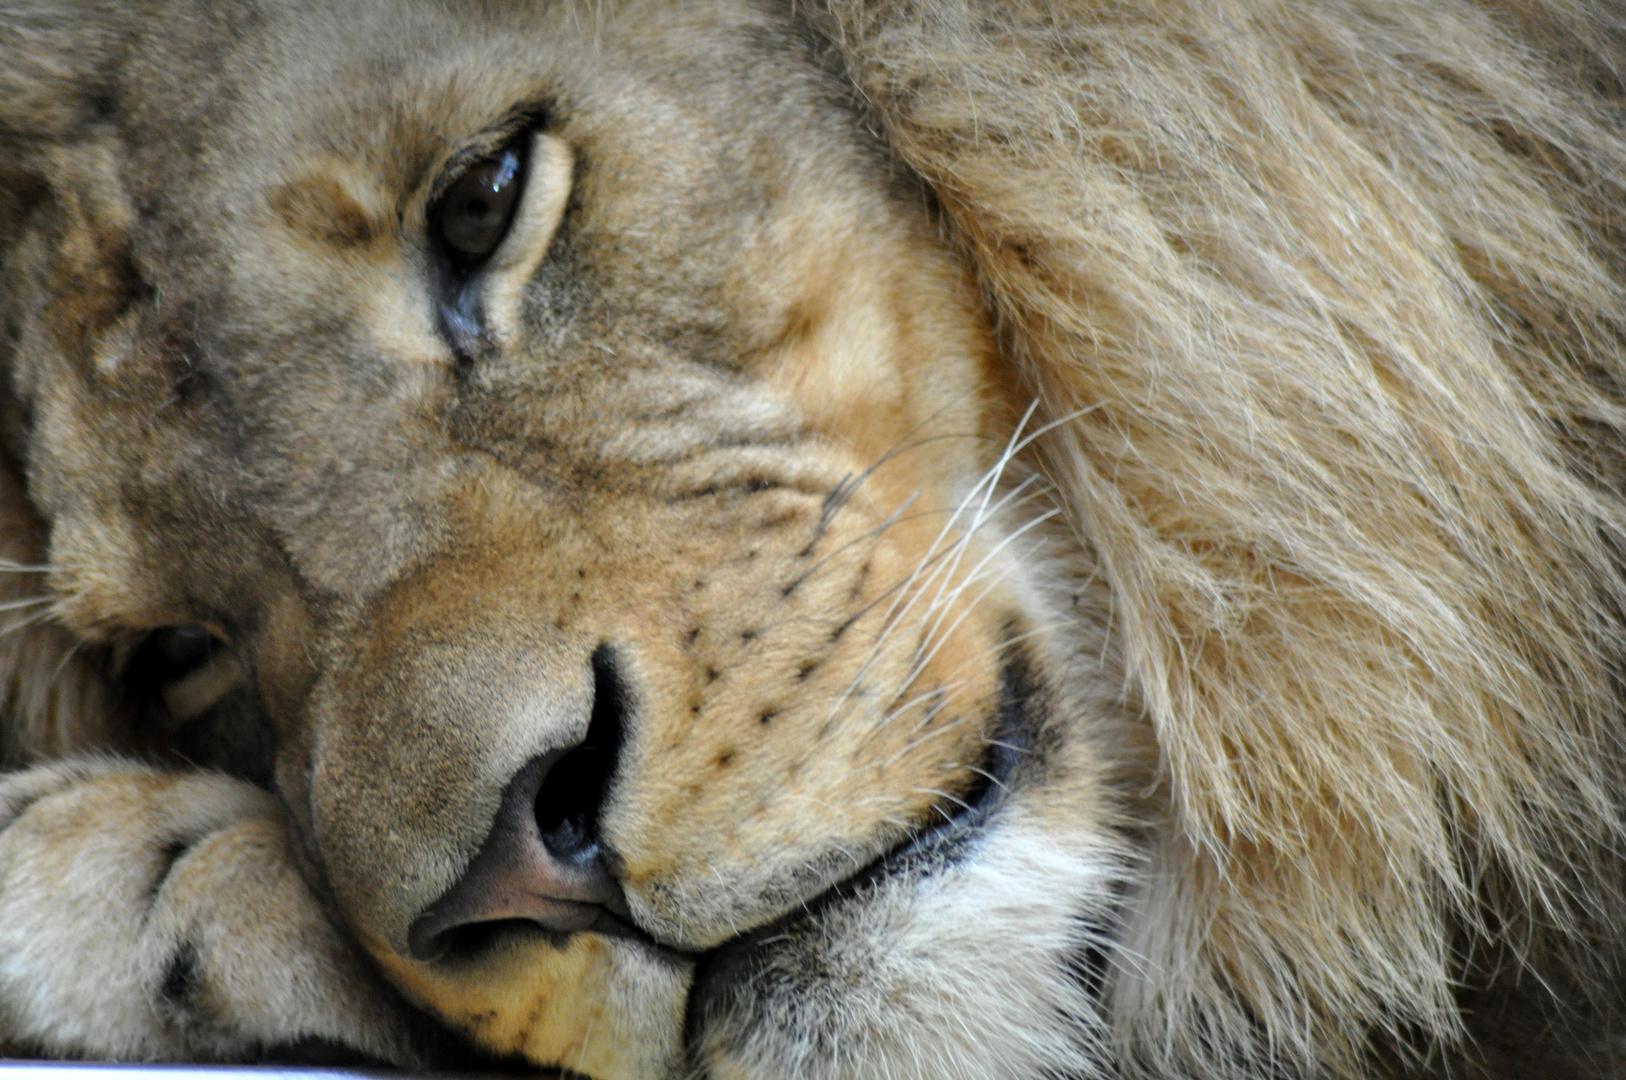 k nig der l wen zoo berlin foto bild tiere zoo wildpark falknerei s ugetiere bilder. Black Bedroom Furniture Sets. Home Design Ideas